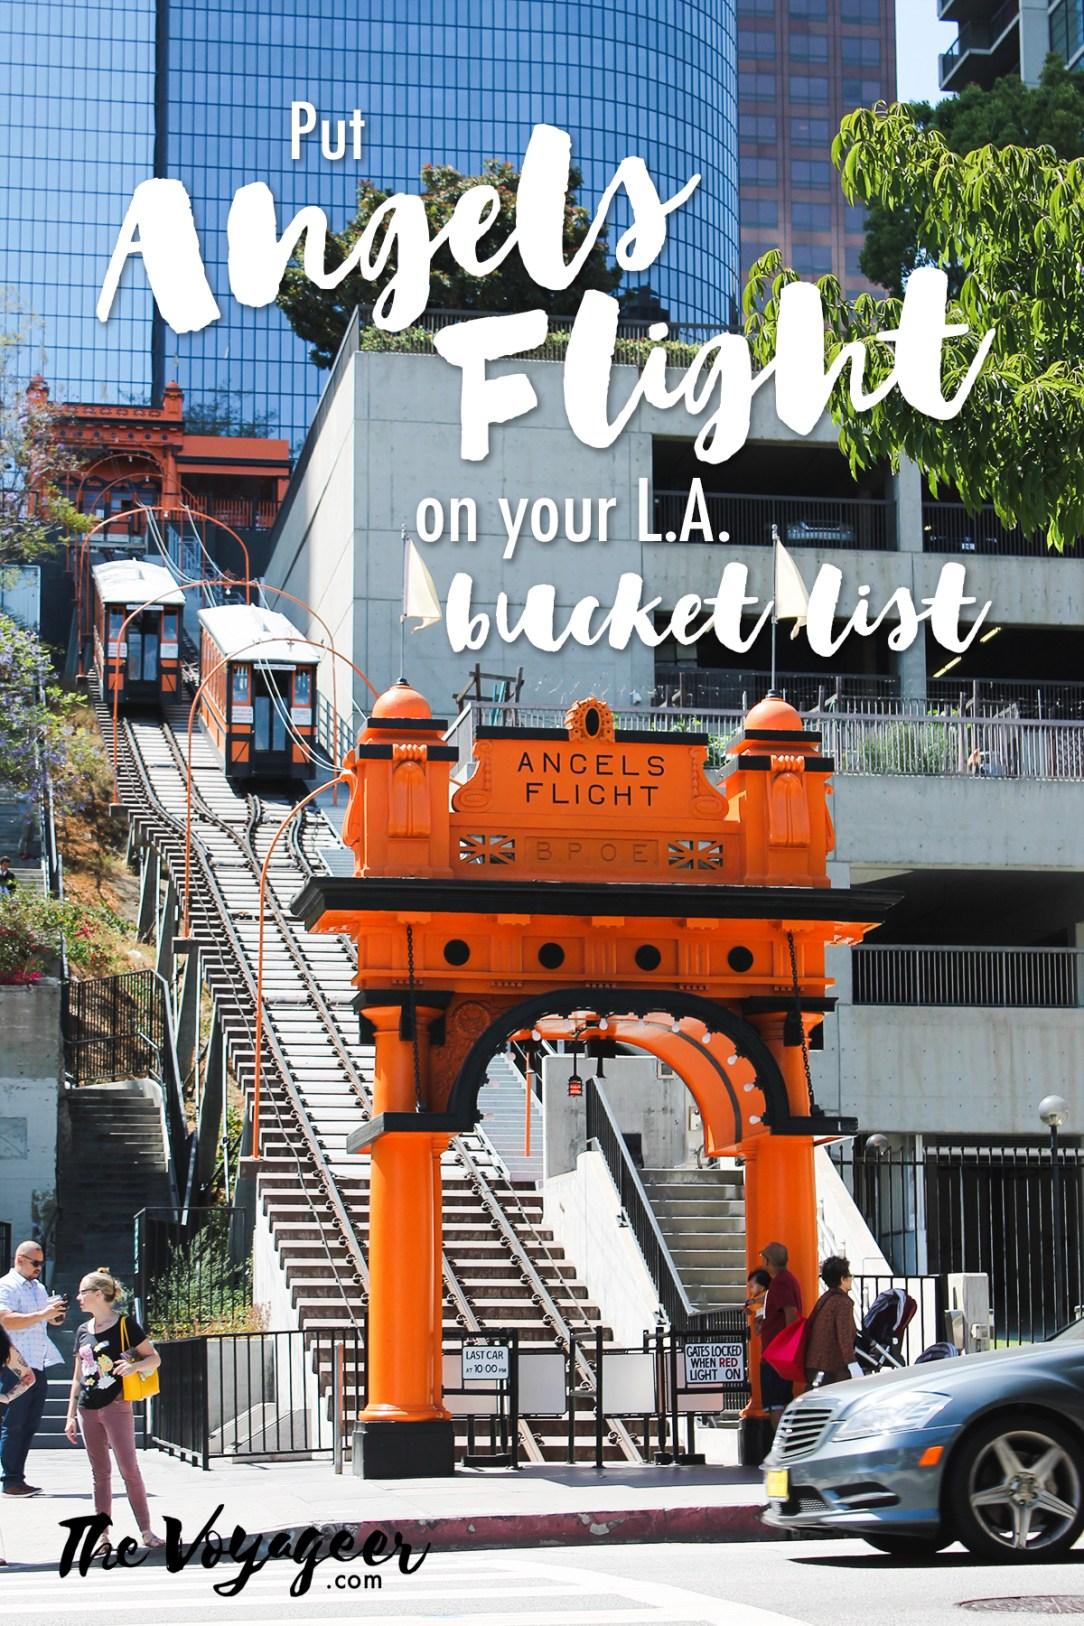 Visit Angels Flight in L.A.